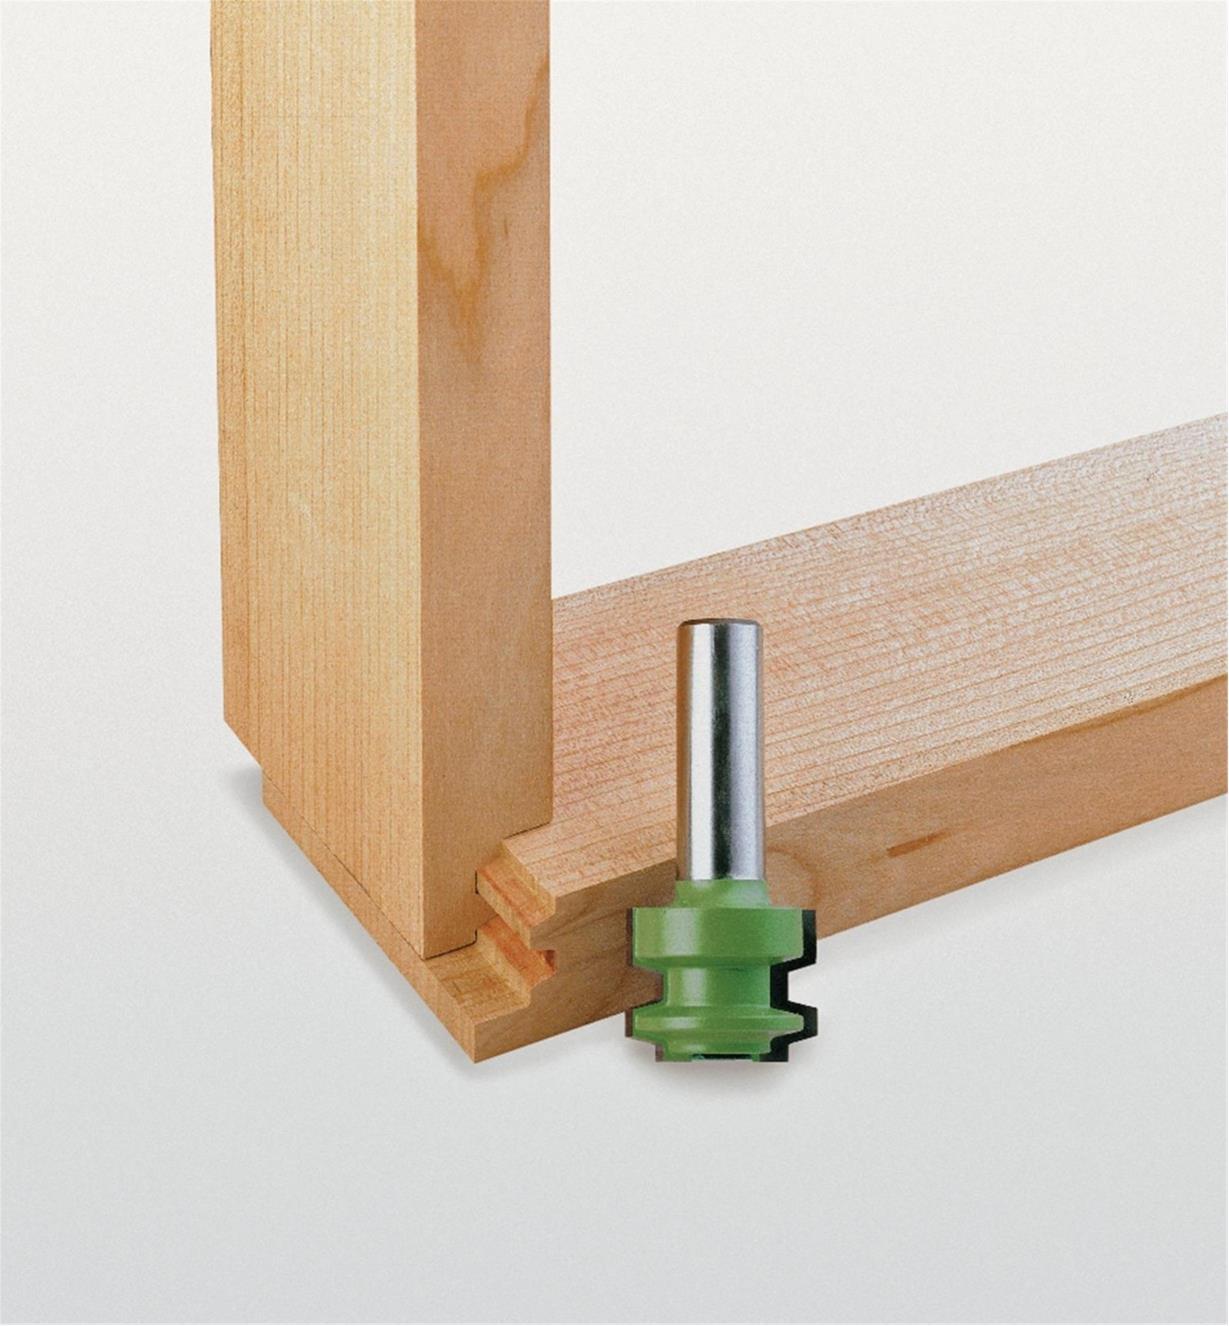 16J7662 - Mèche pour assemblage de tiroir, 11/16pox3/4pox1/2po